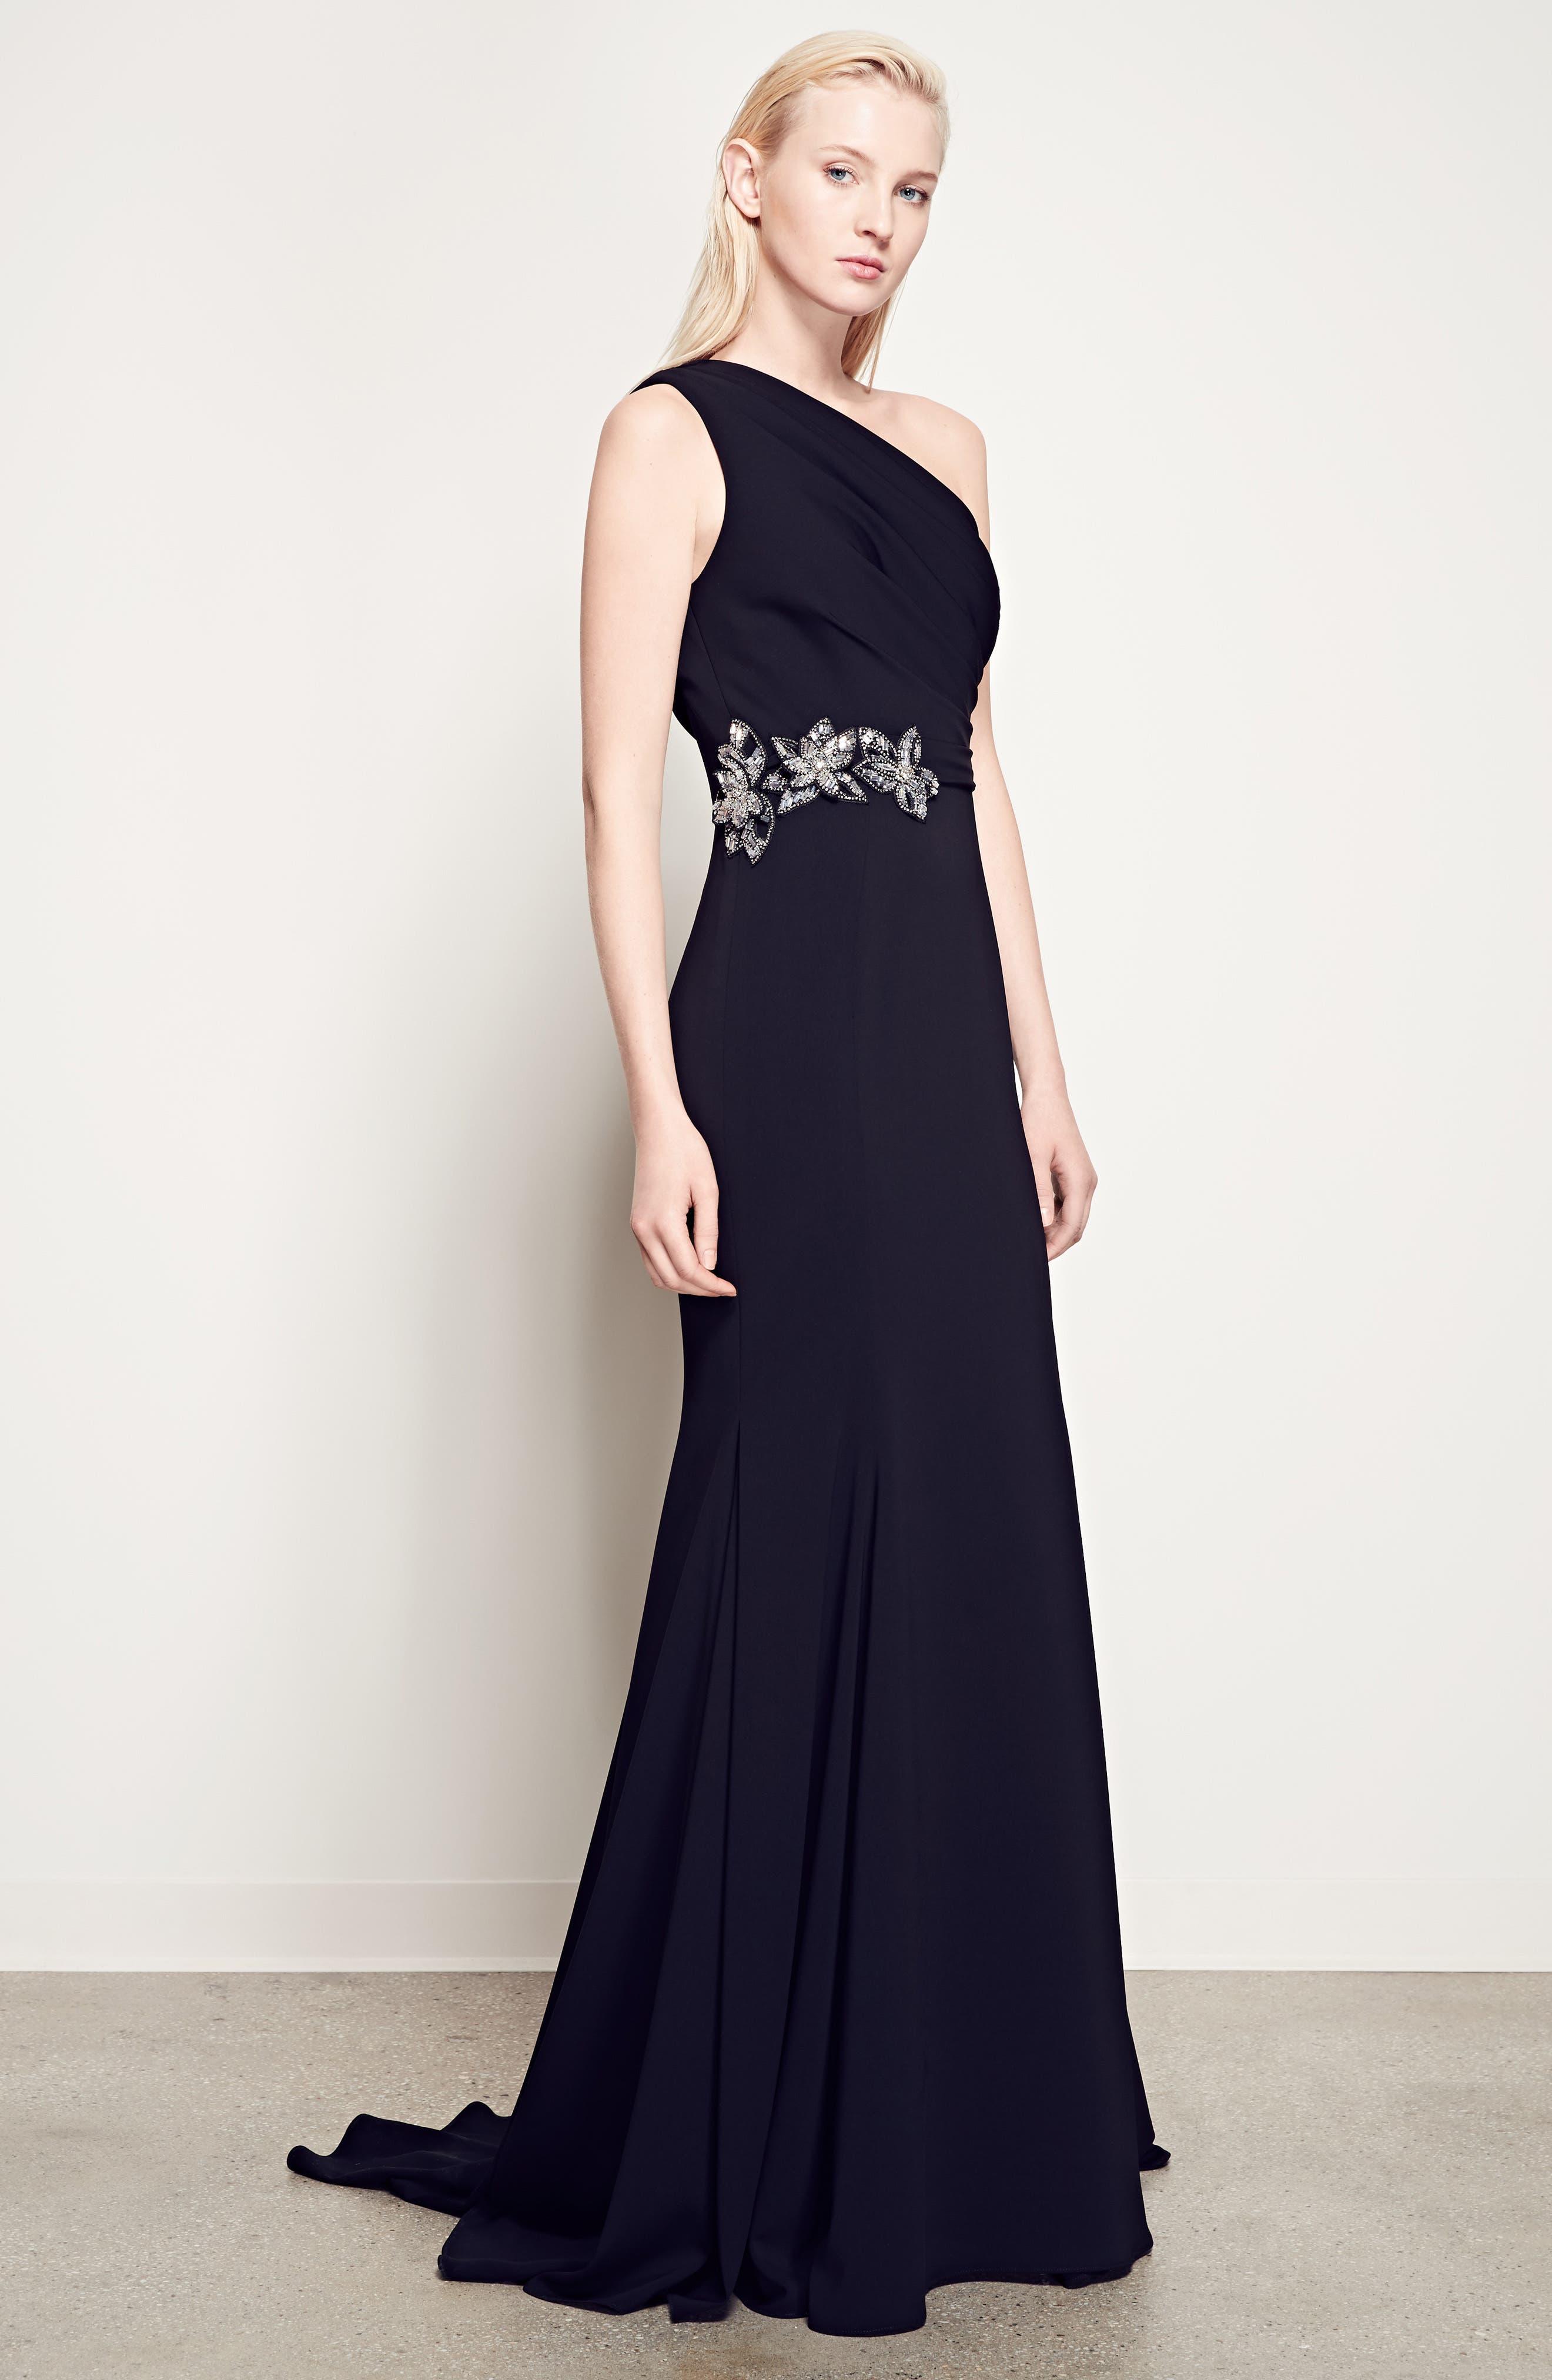 Badgley Mischka Couture Odessa Embellished One-Shoulder Gown,                         Main,                         color, 001